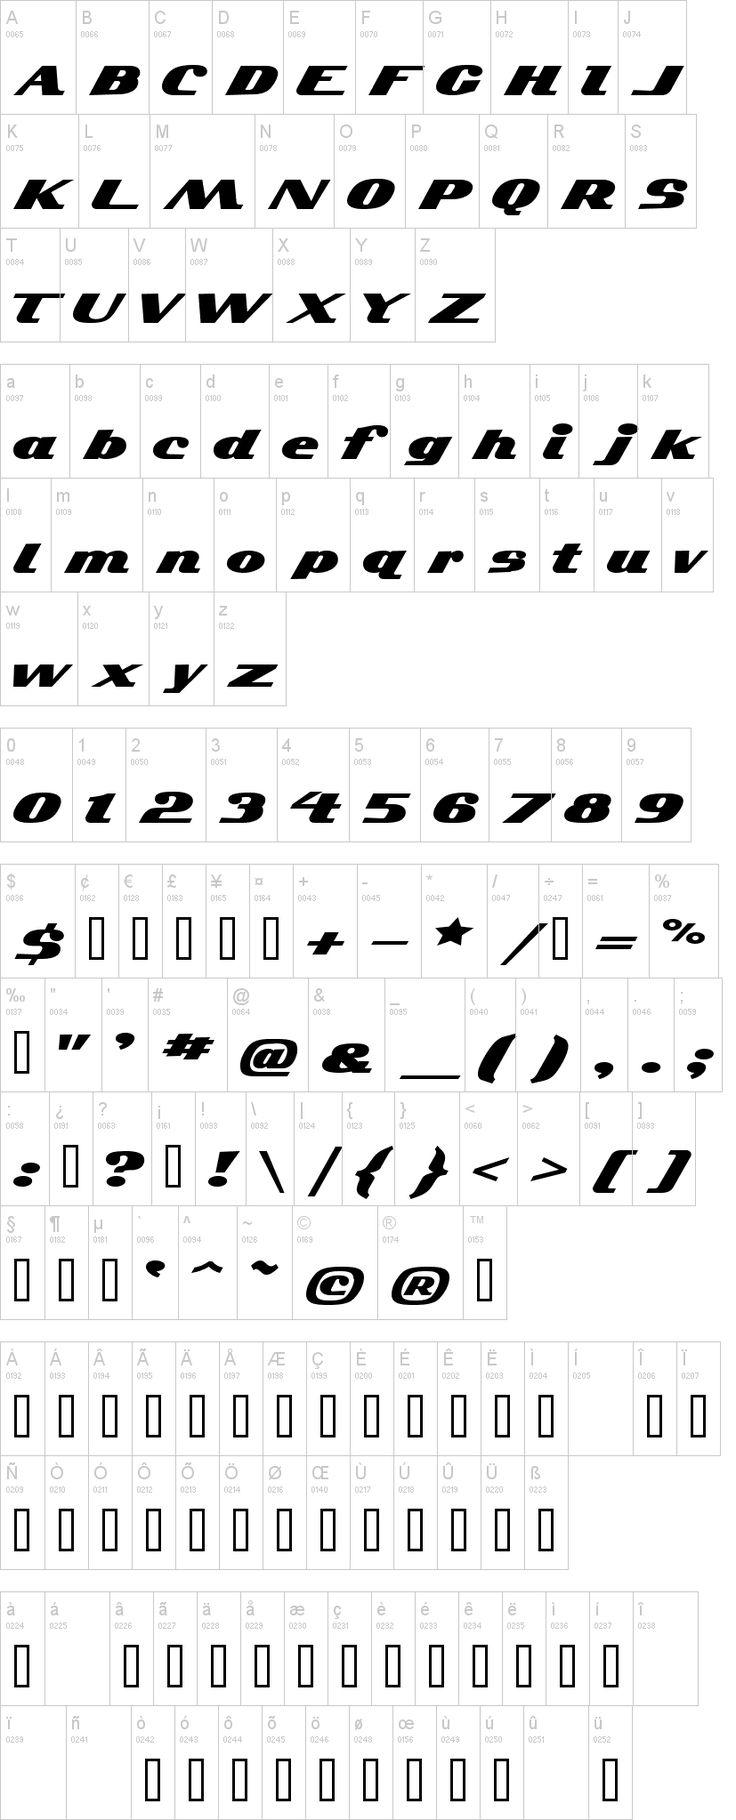 Disney Pixar Fonts - 8 styles - FontSpace